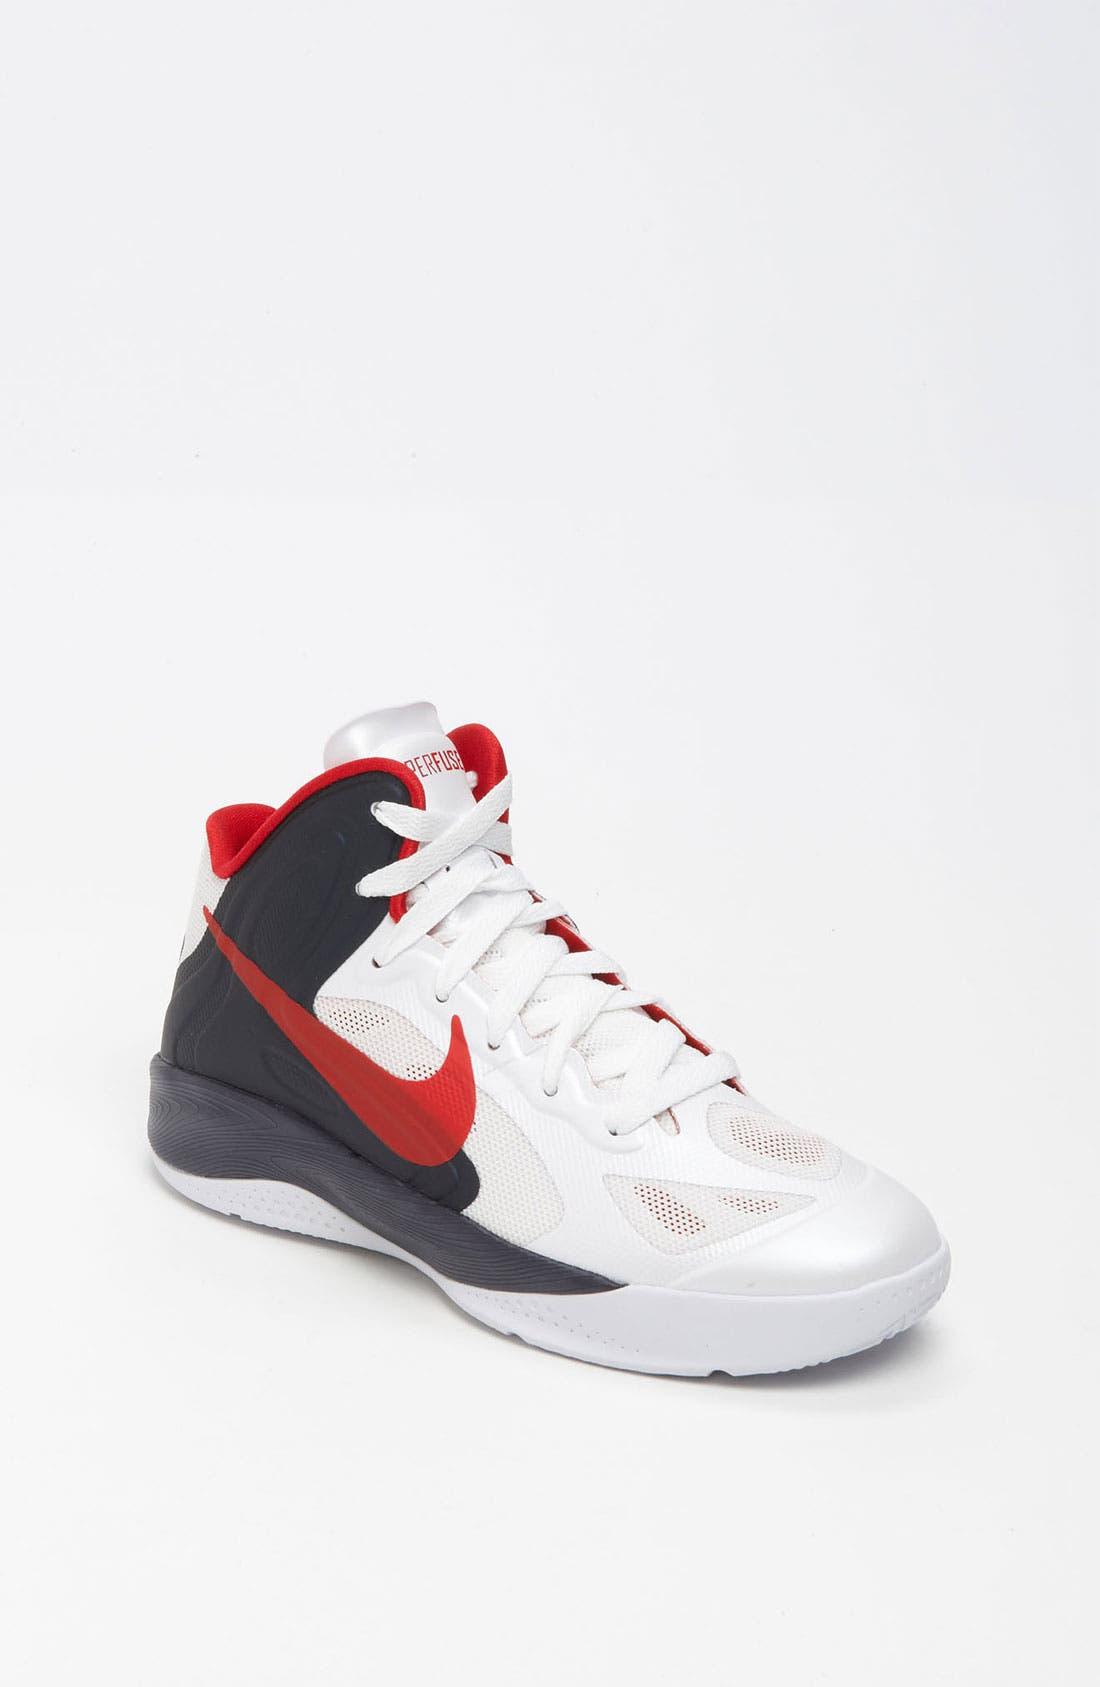 Alternate Image 1 Selected - Nike 'Hyperfuse 2012' Basketball Shoe (Big Kid)